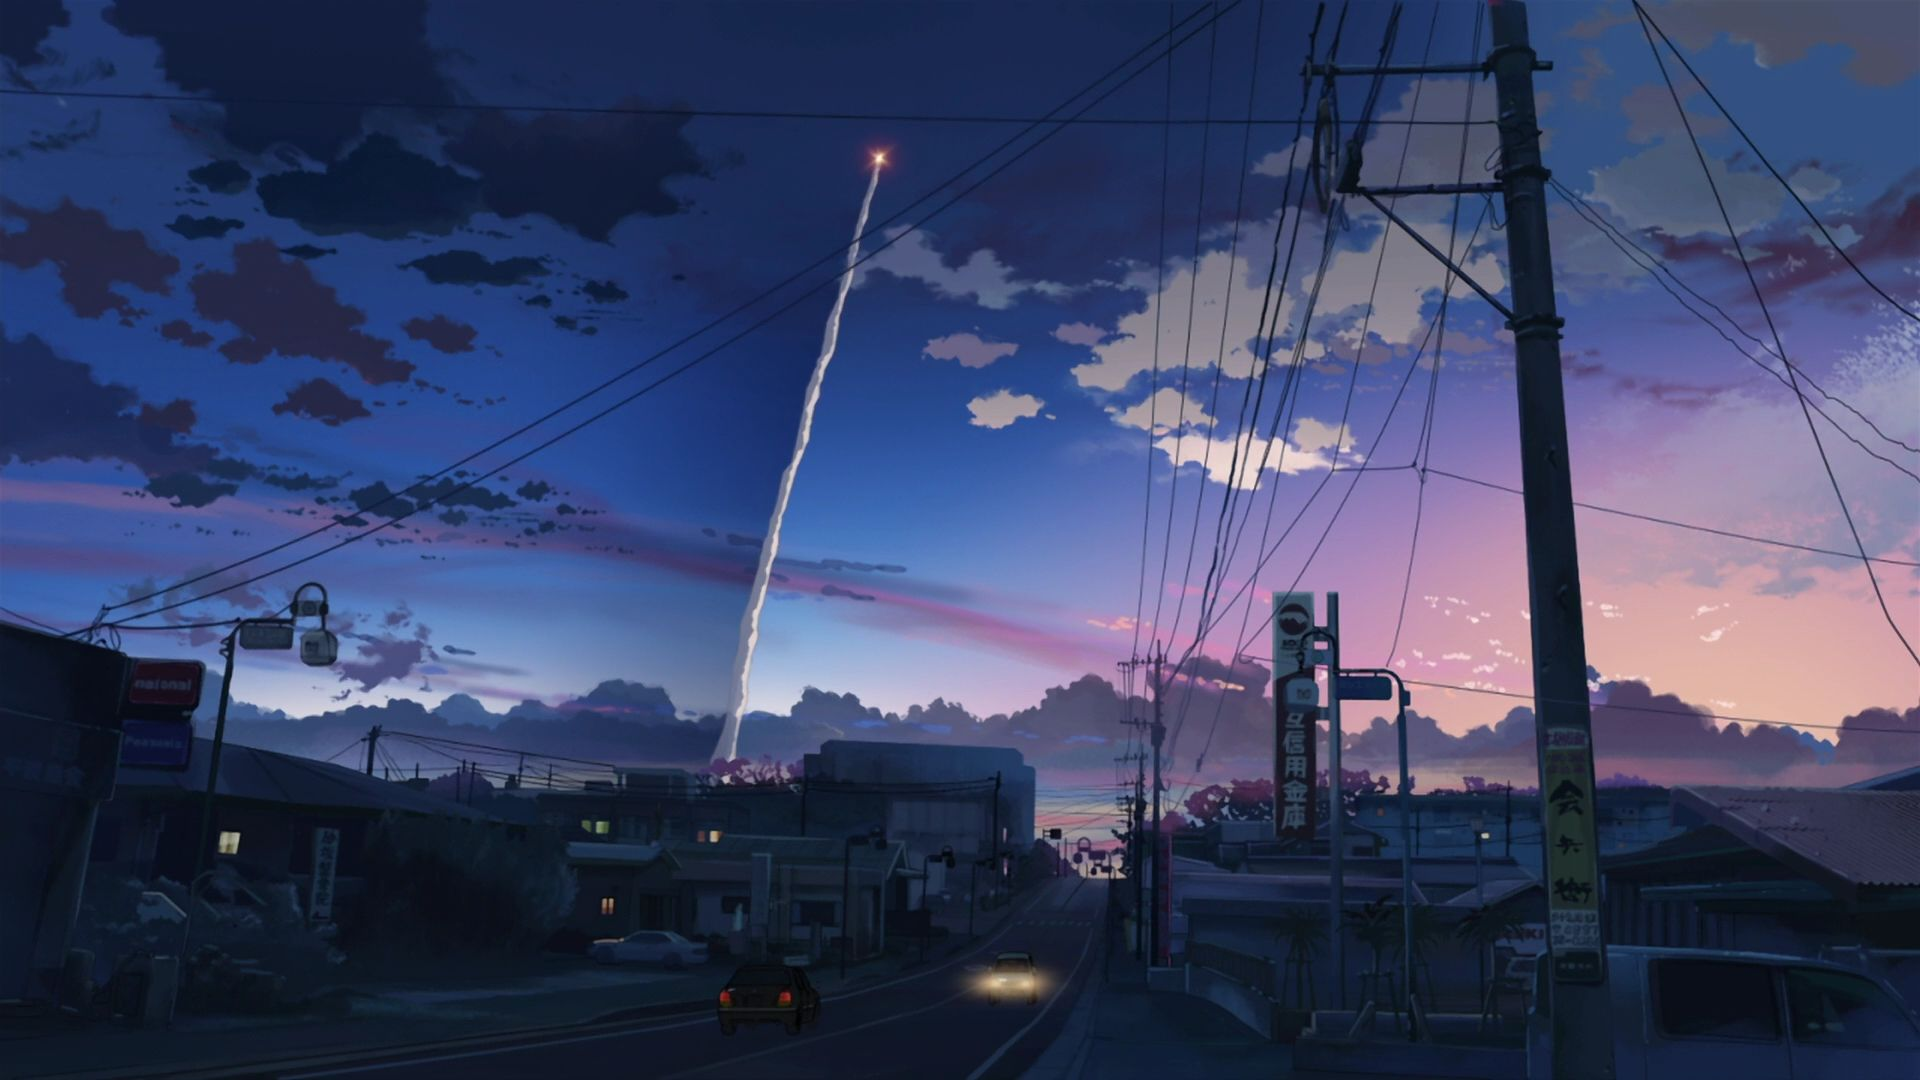 download Aesthetic Anime Desktop Wallpapers Top Aesthetic 1920x1080